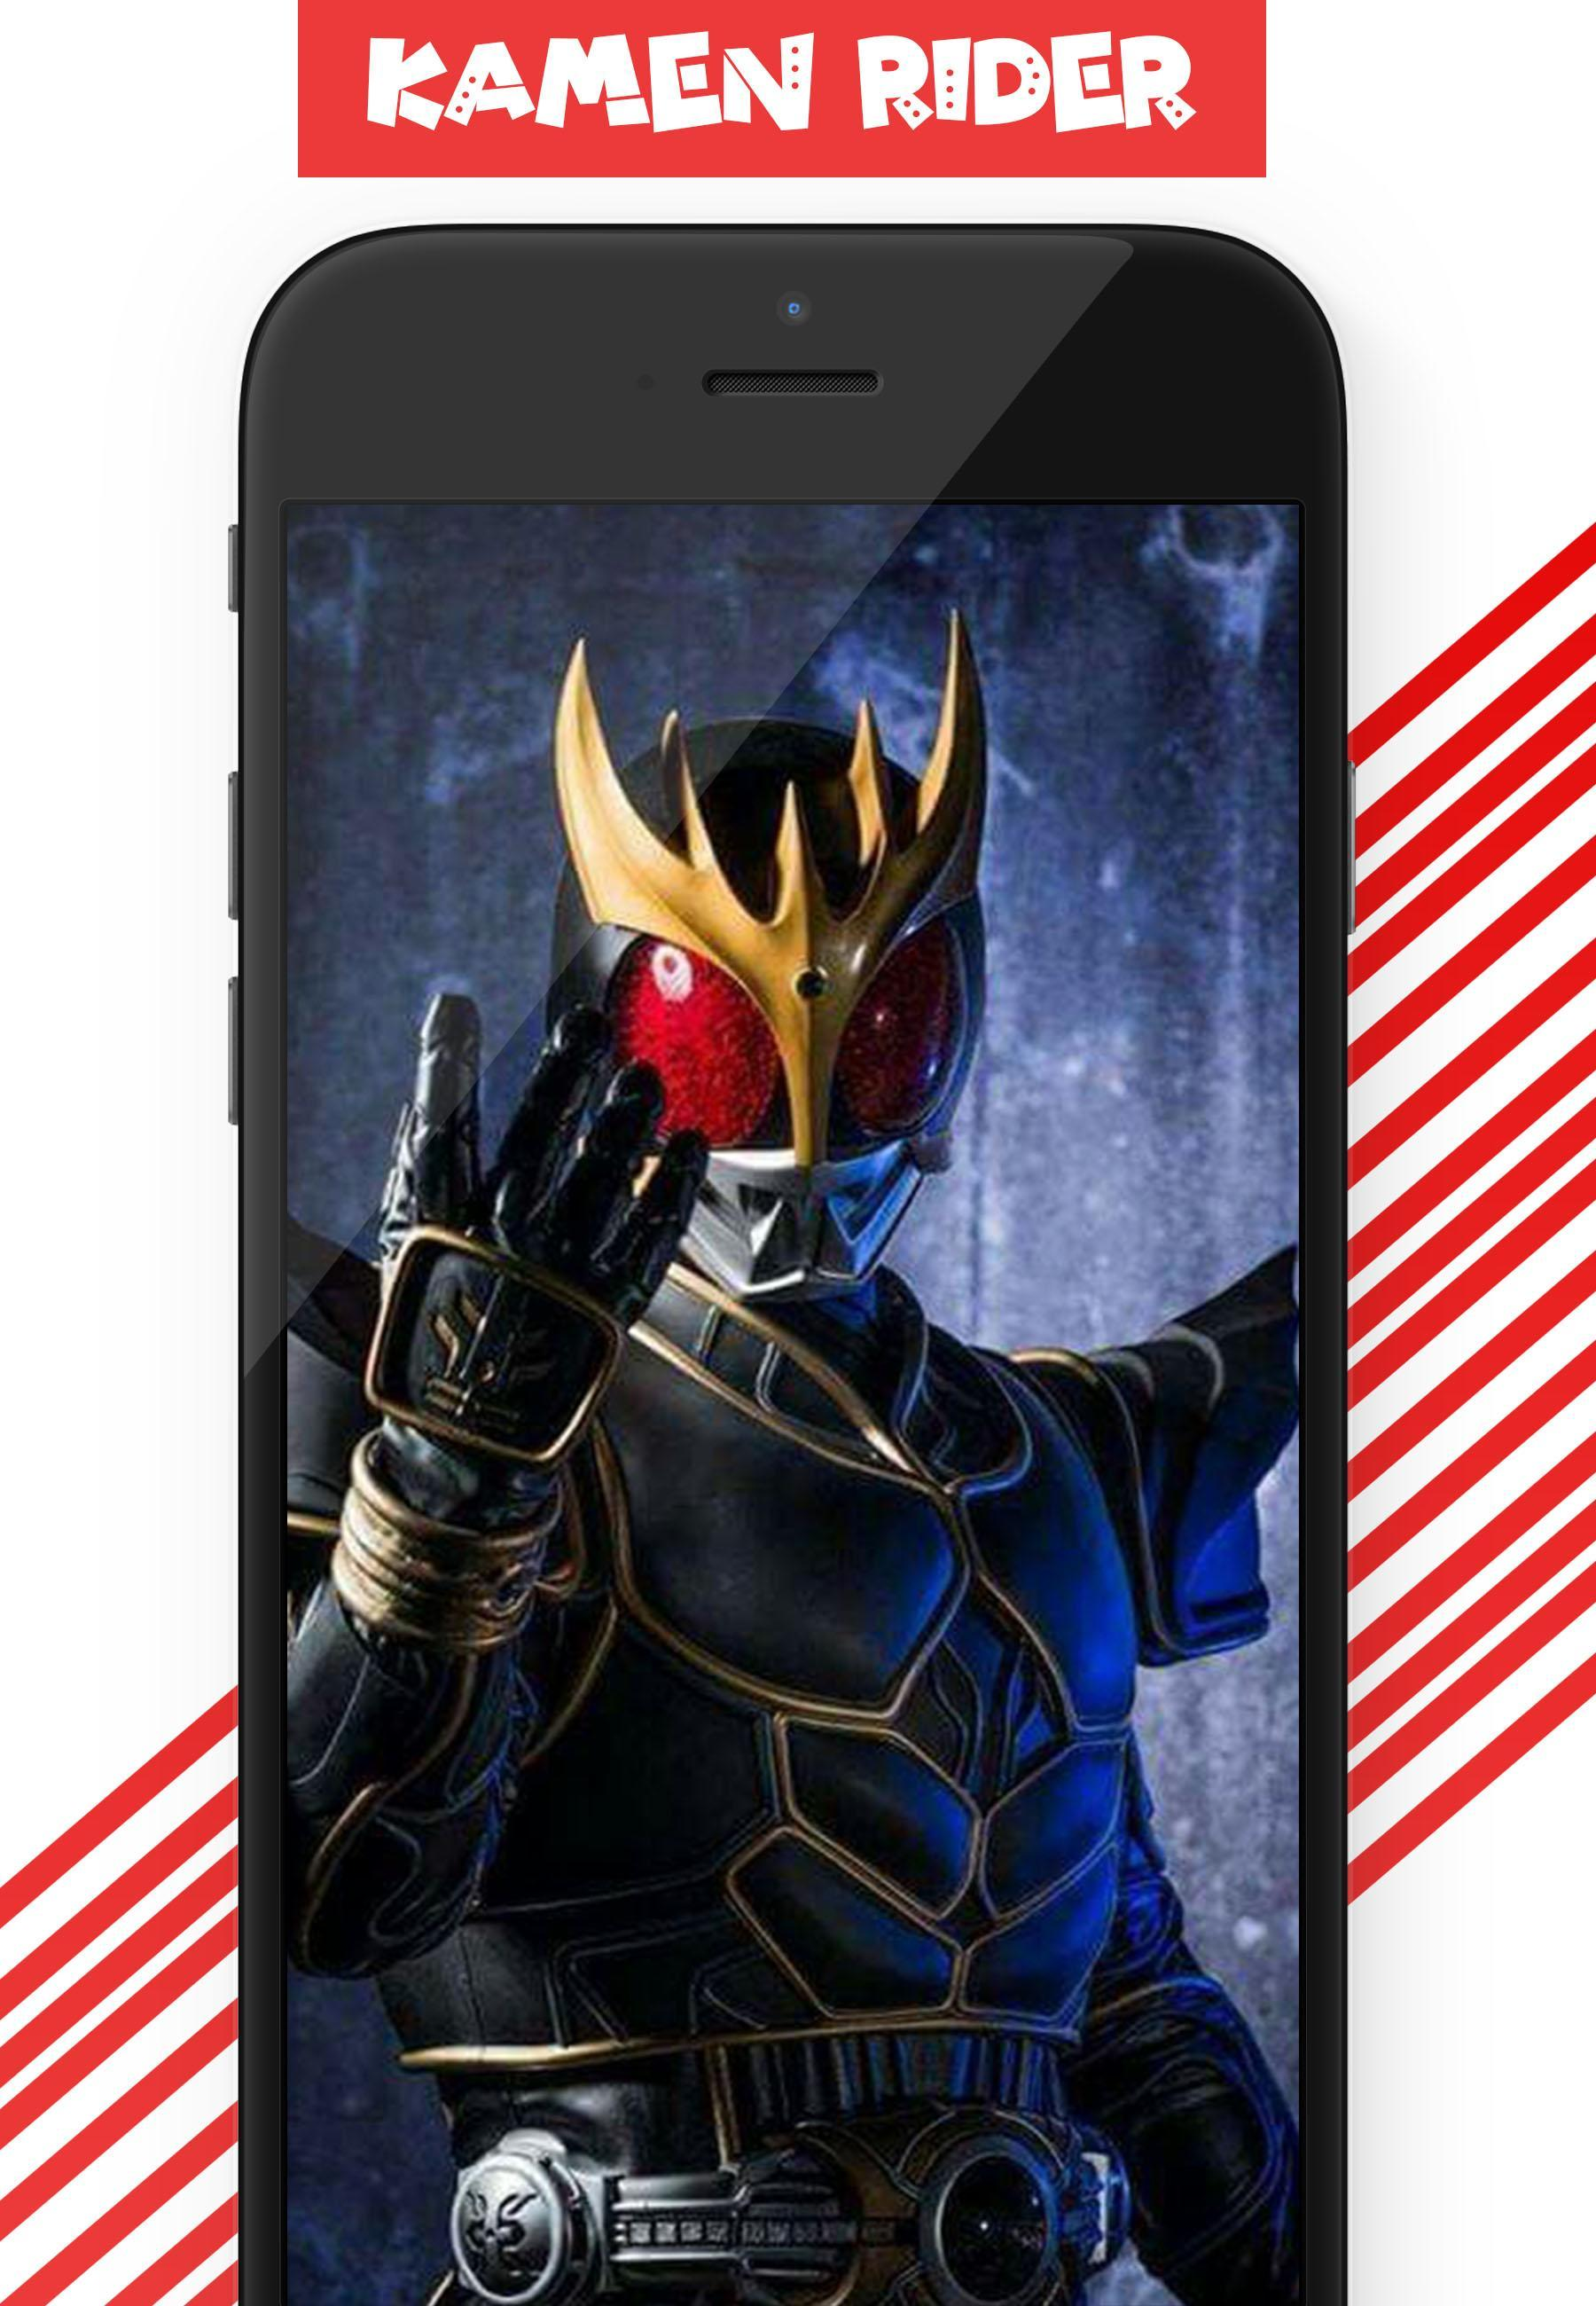 Kamen Rider Wallpaper Hd For Android Apk Download